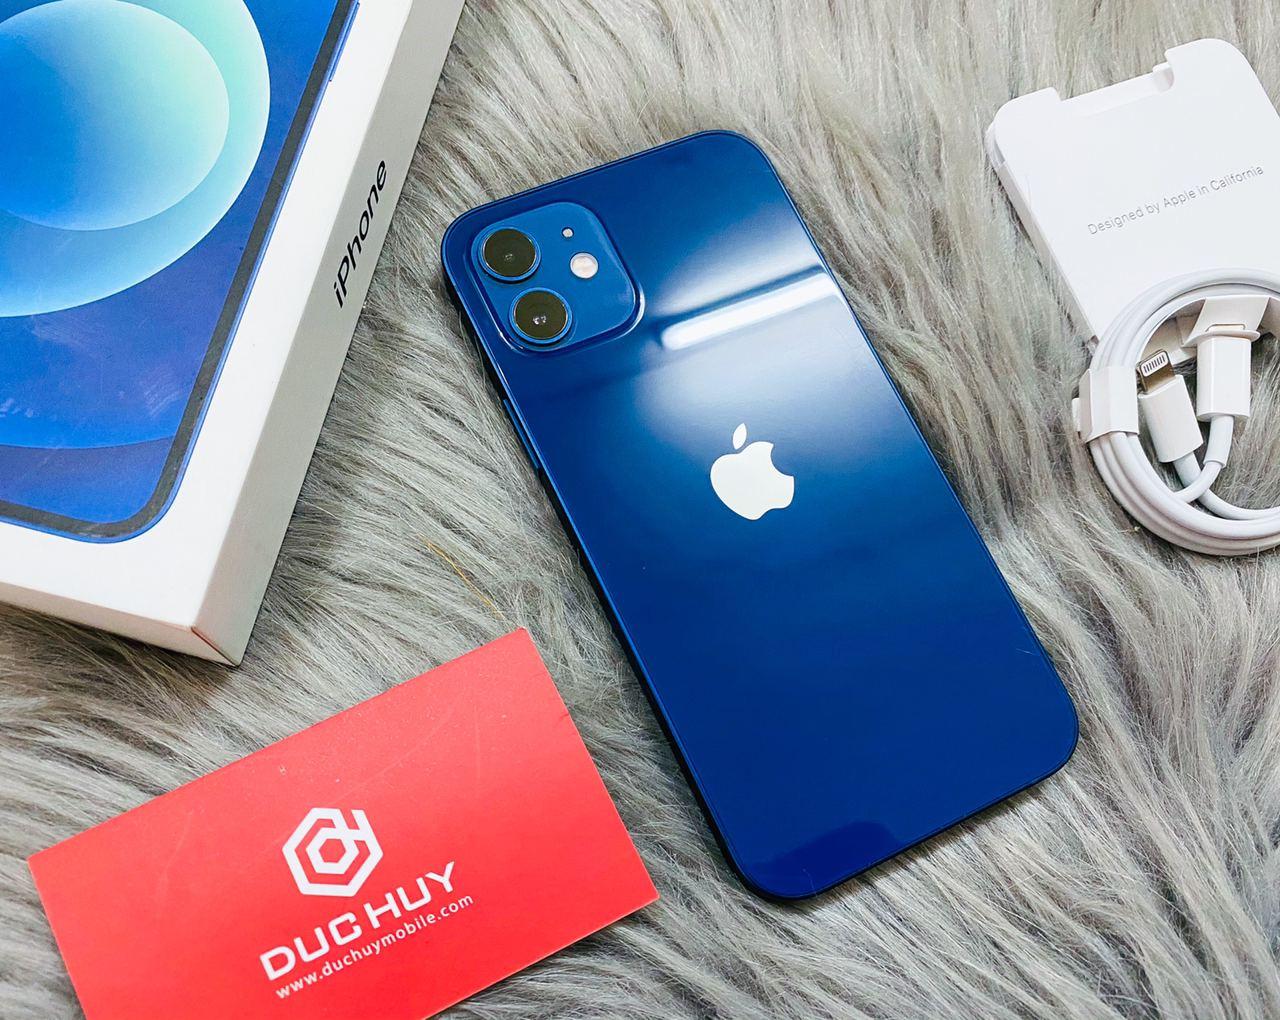 thiết kế iphone 12 64gb